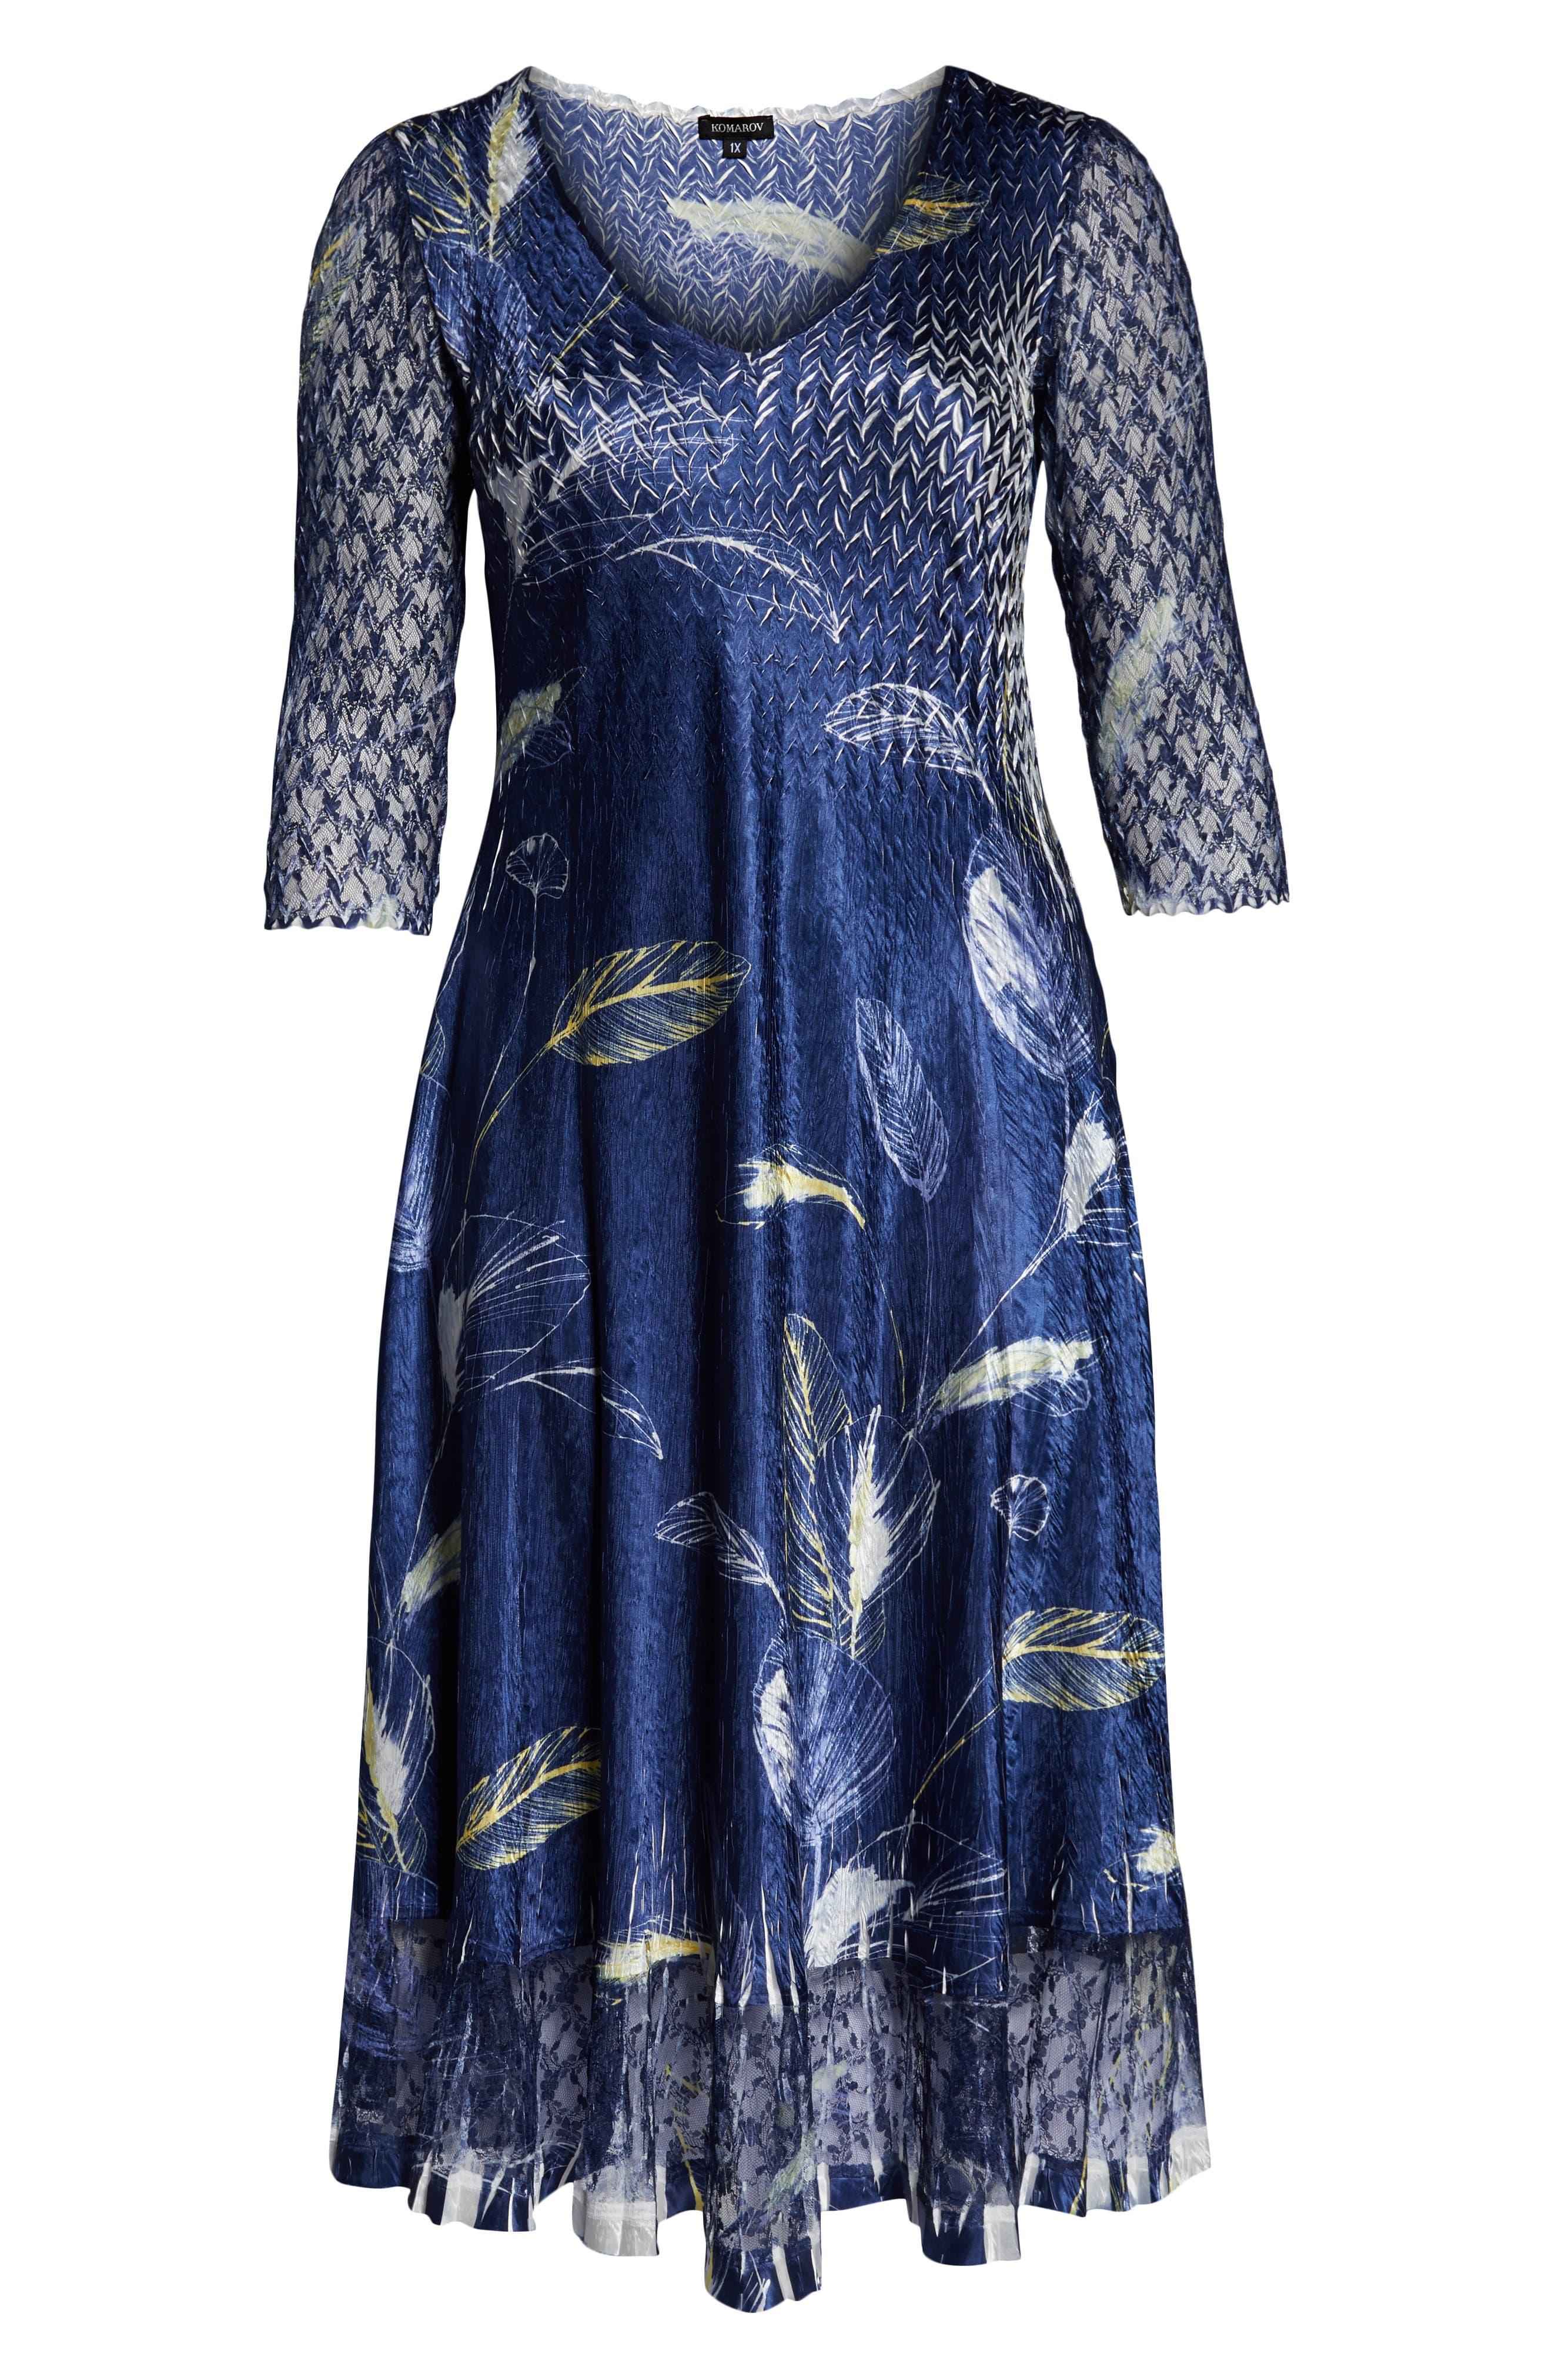 KOMAROV, Print Charmeuse A-Line Dress, Alternate thumbnail 7, color, INDIGO TROPIC